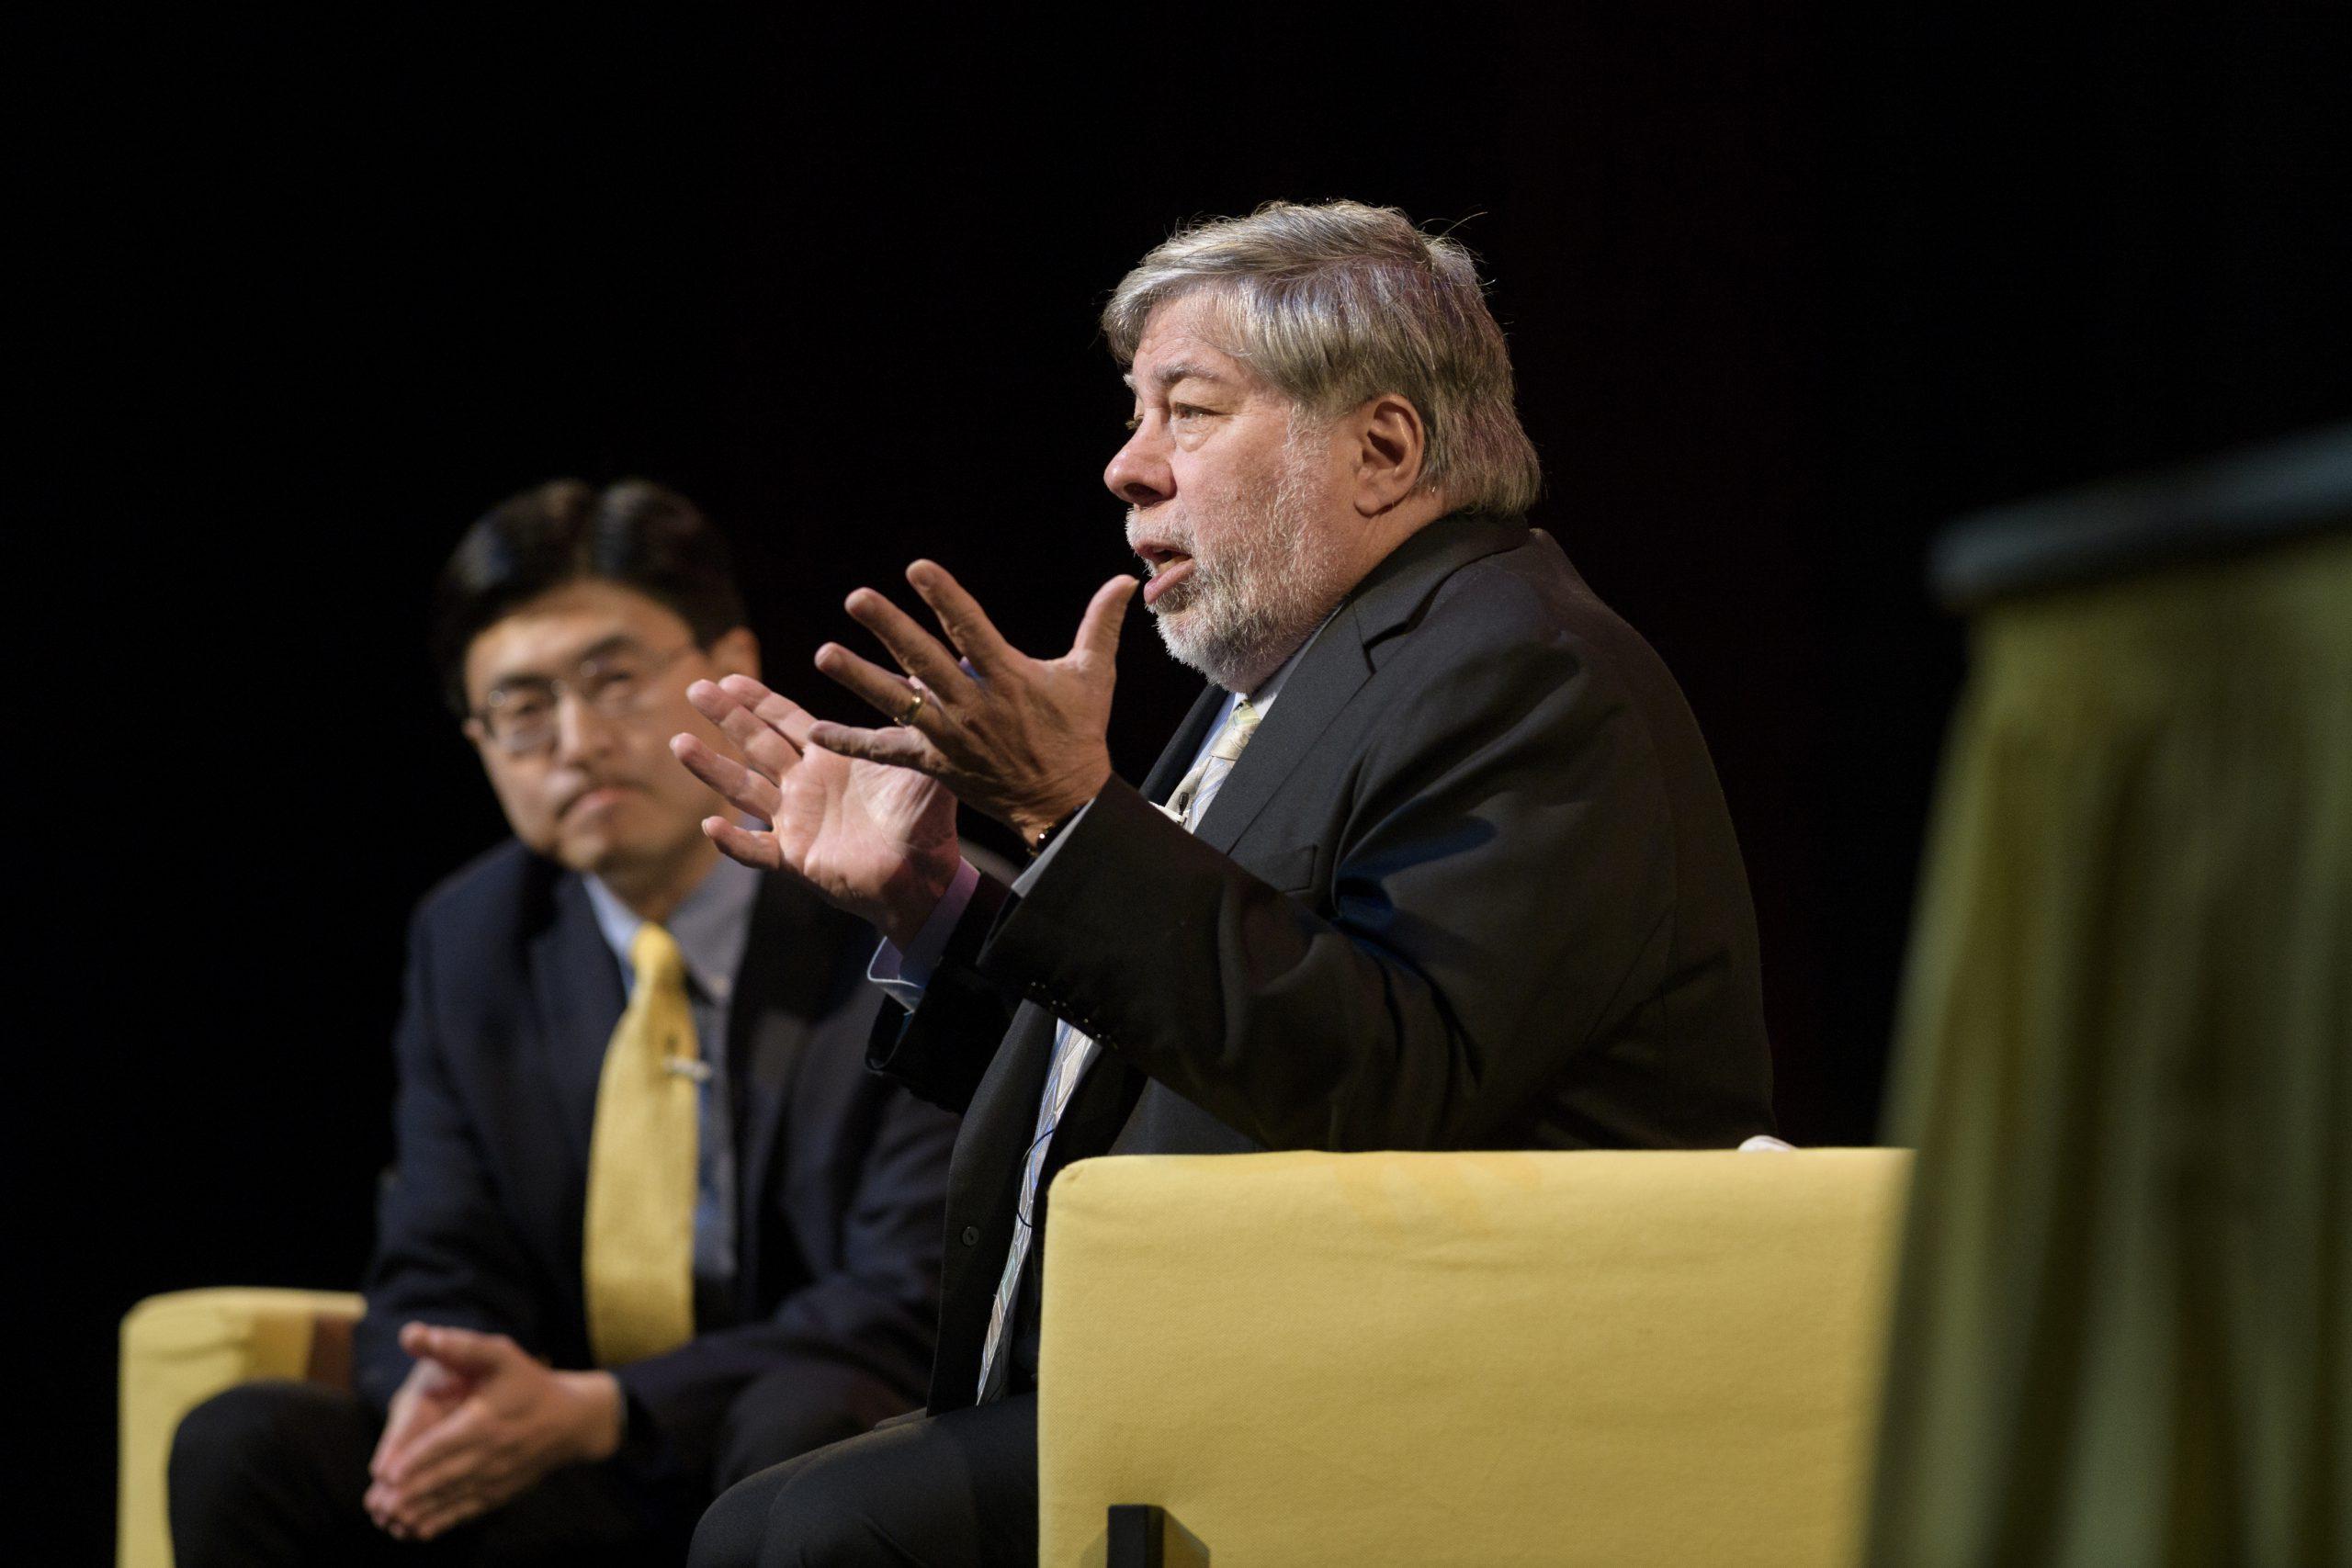 Spoluzakladatel Applu Steve Wozniak vystoupí na pražském SWCSummitu